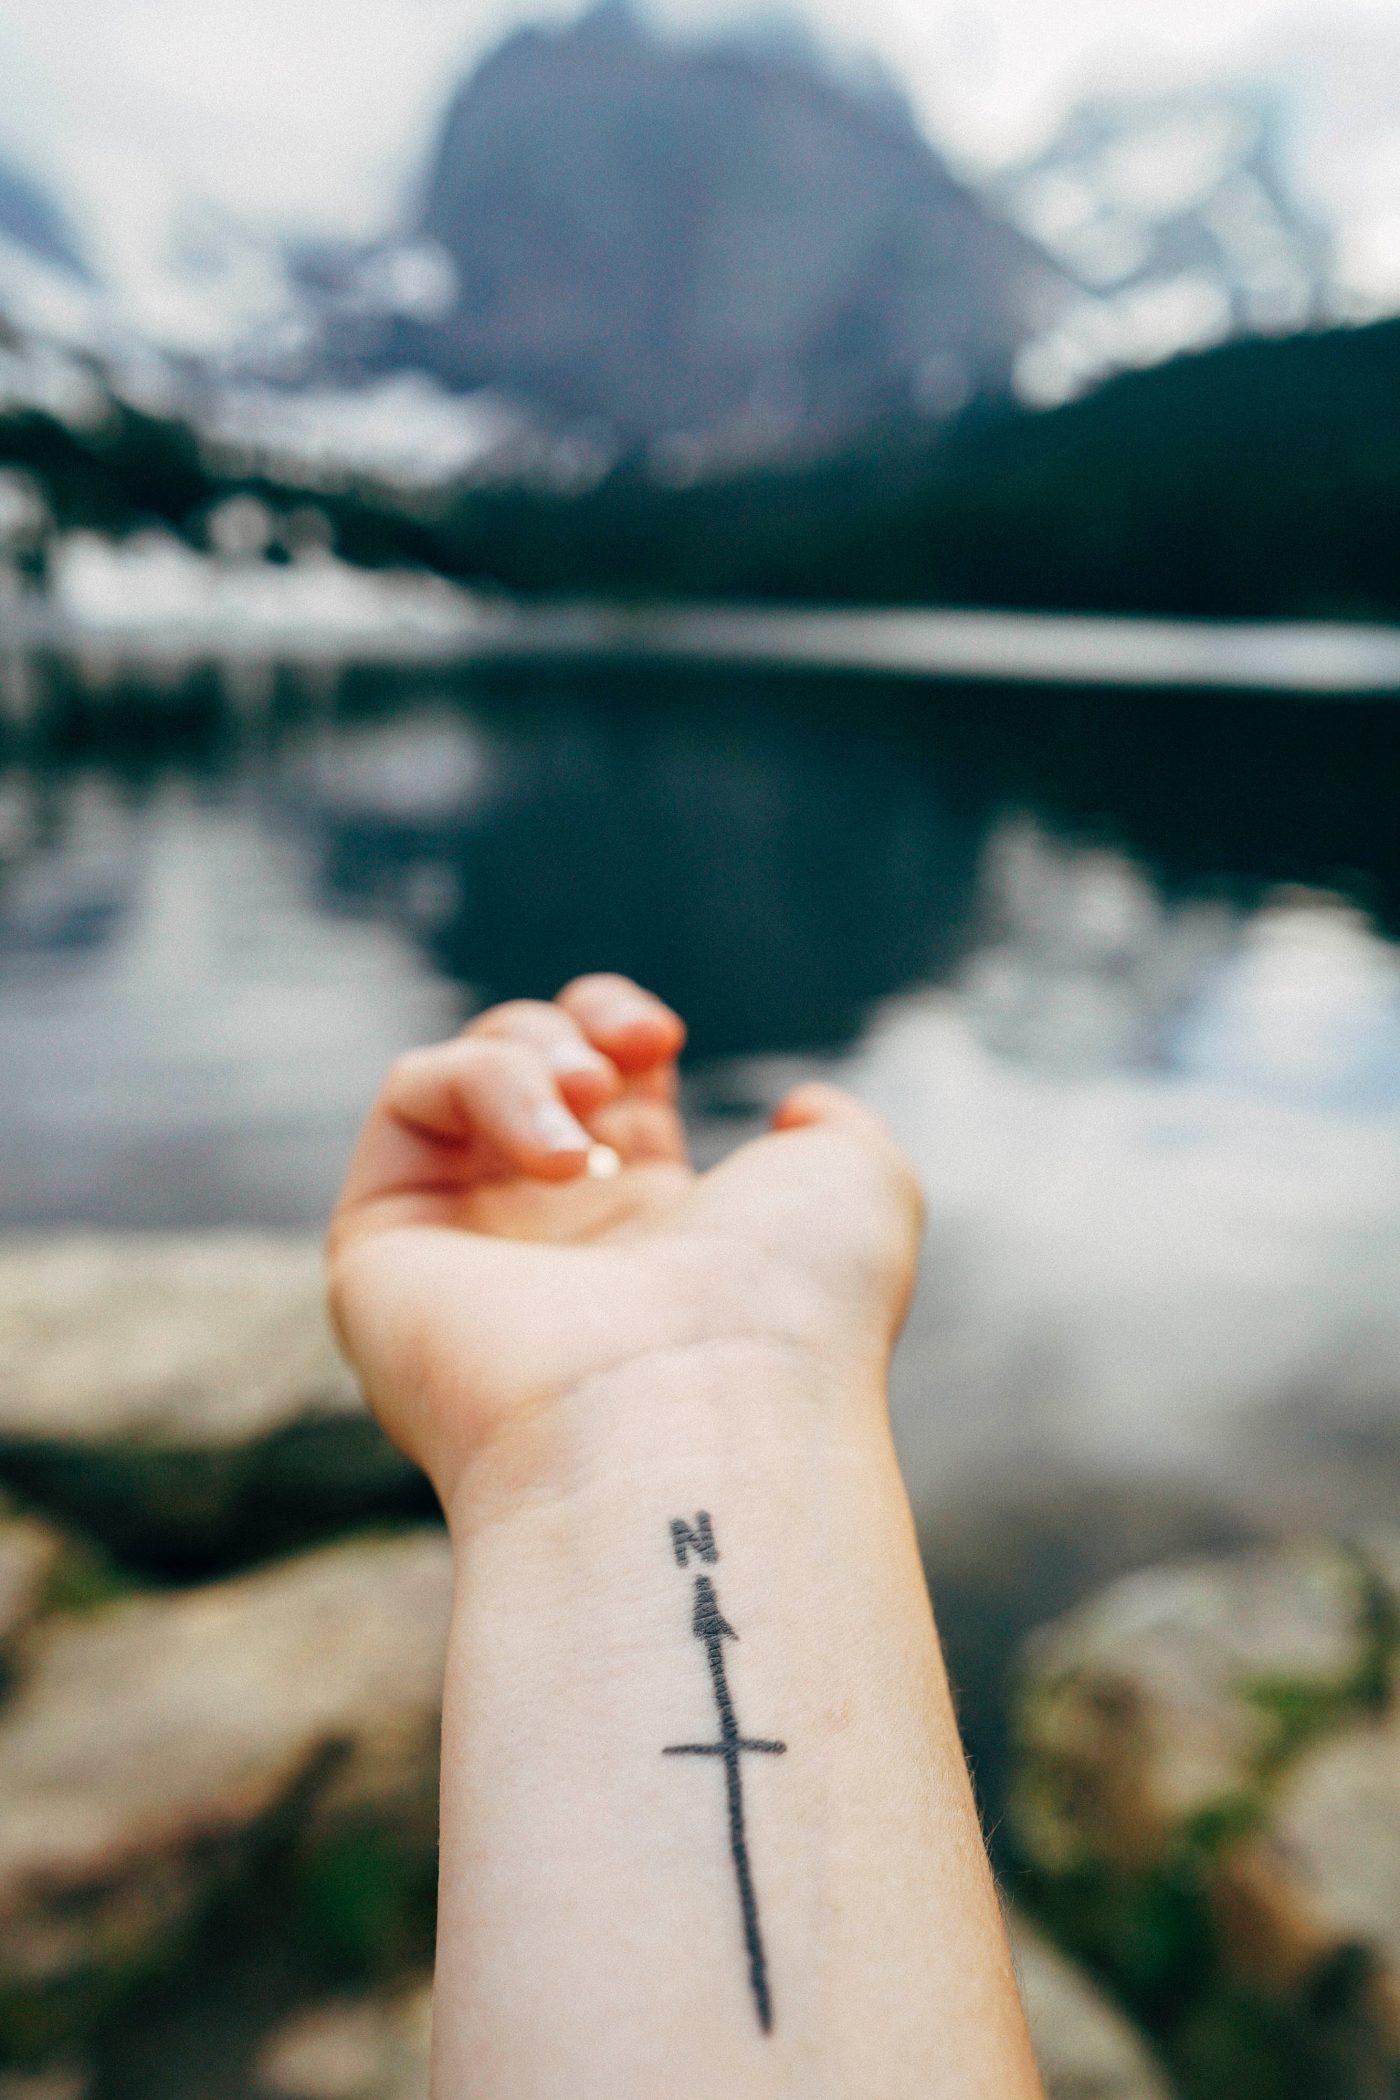 north tattoo in arm